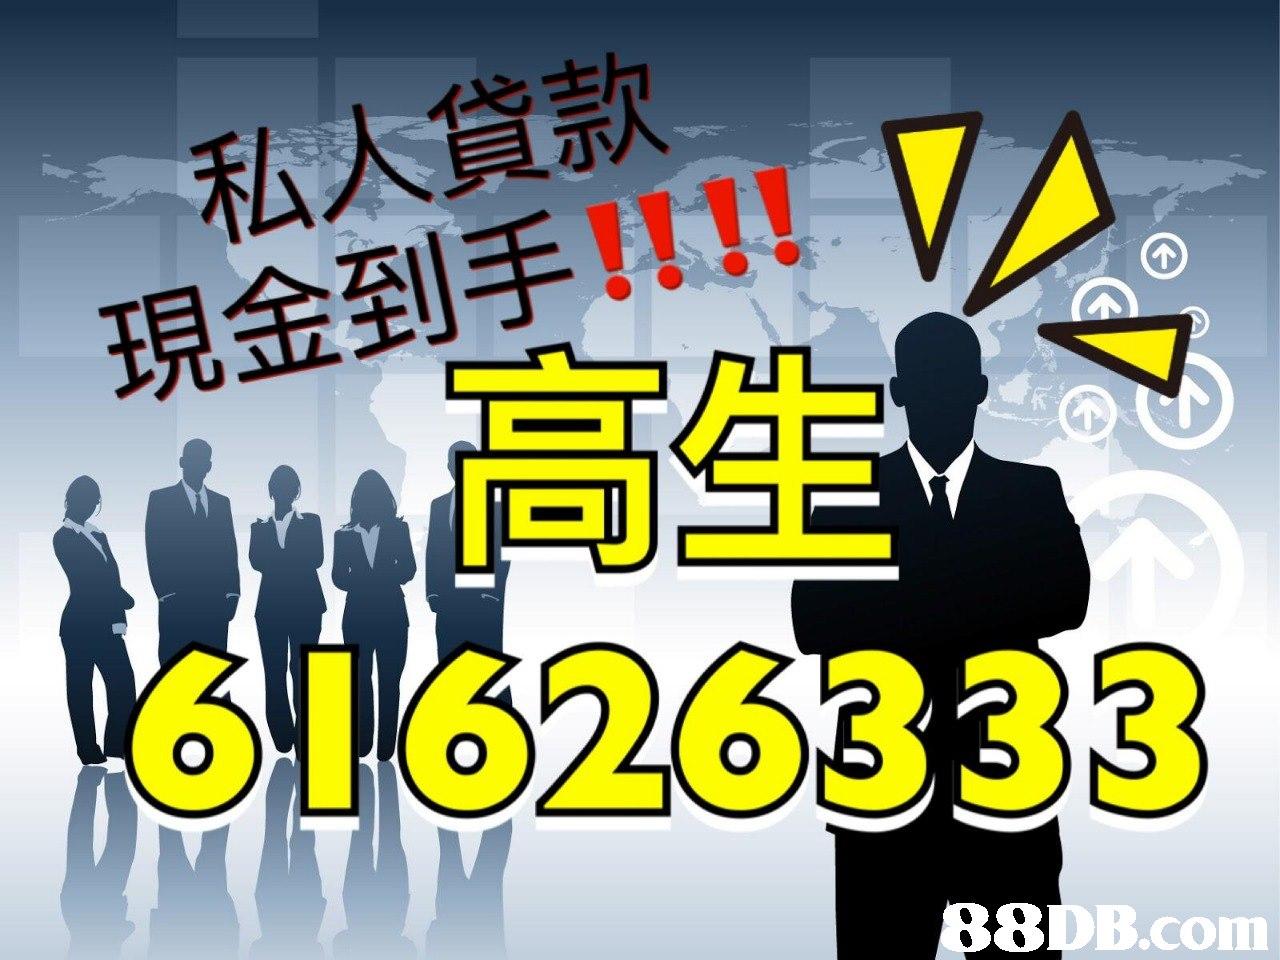 私人貸款 現金到手111TV 高生 61626333 B.com  Font,Text,Team,Graphic design,